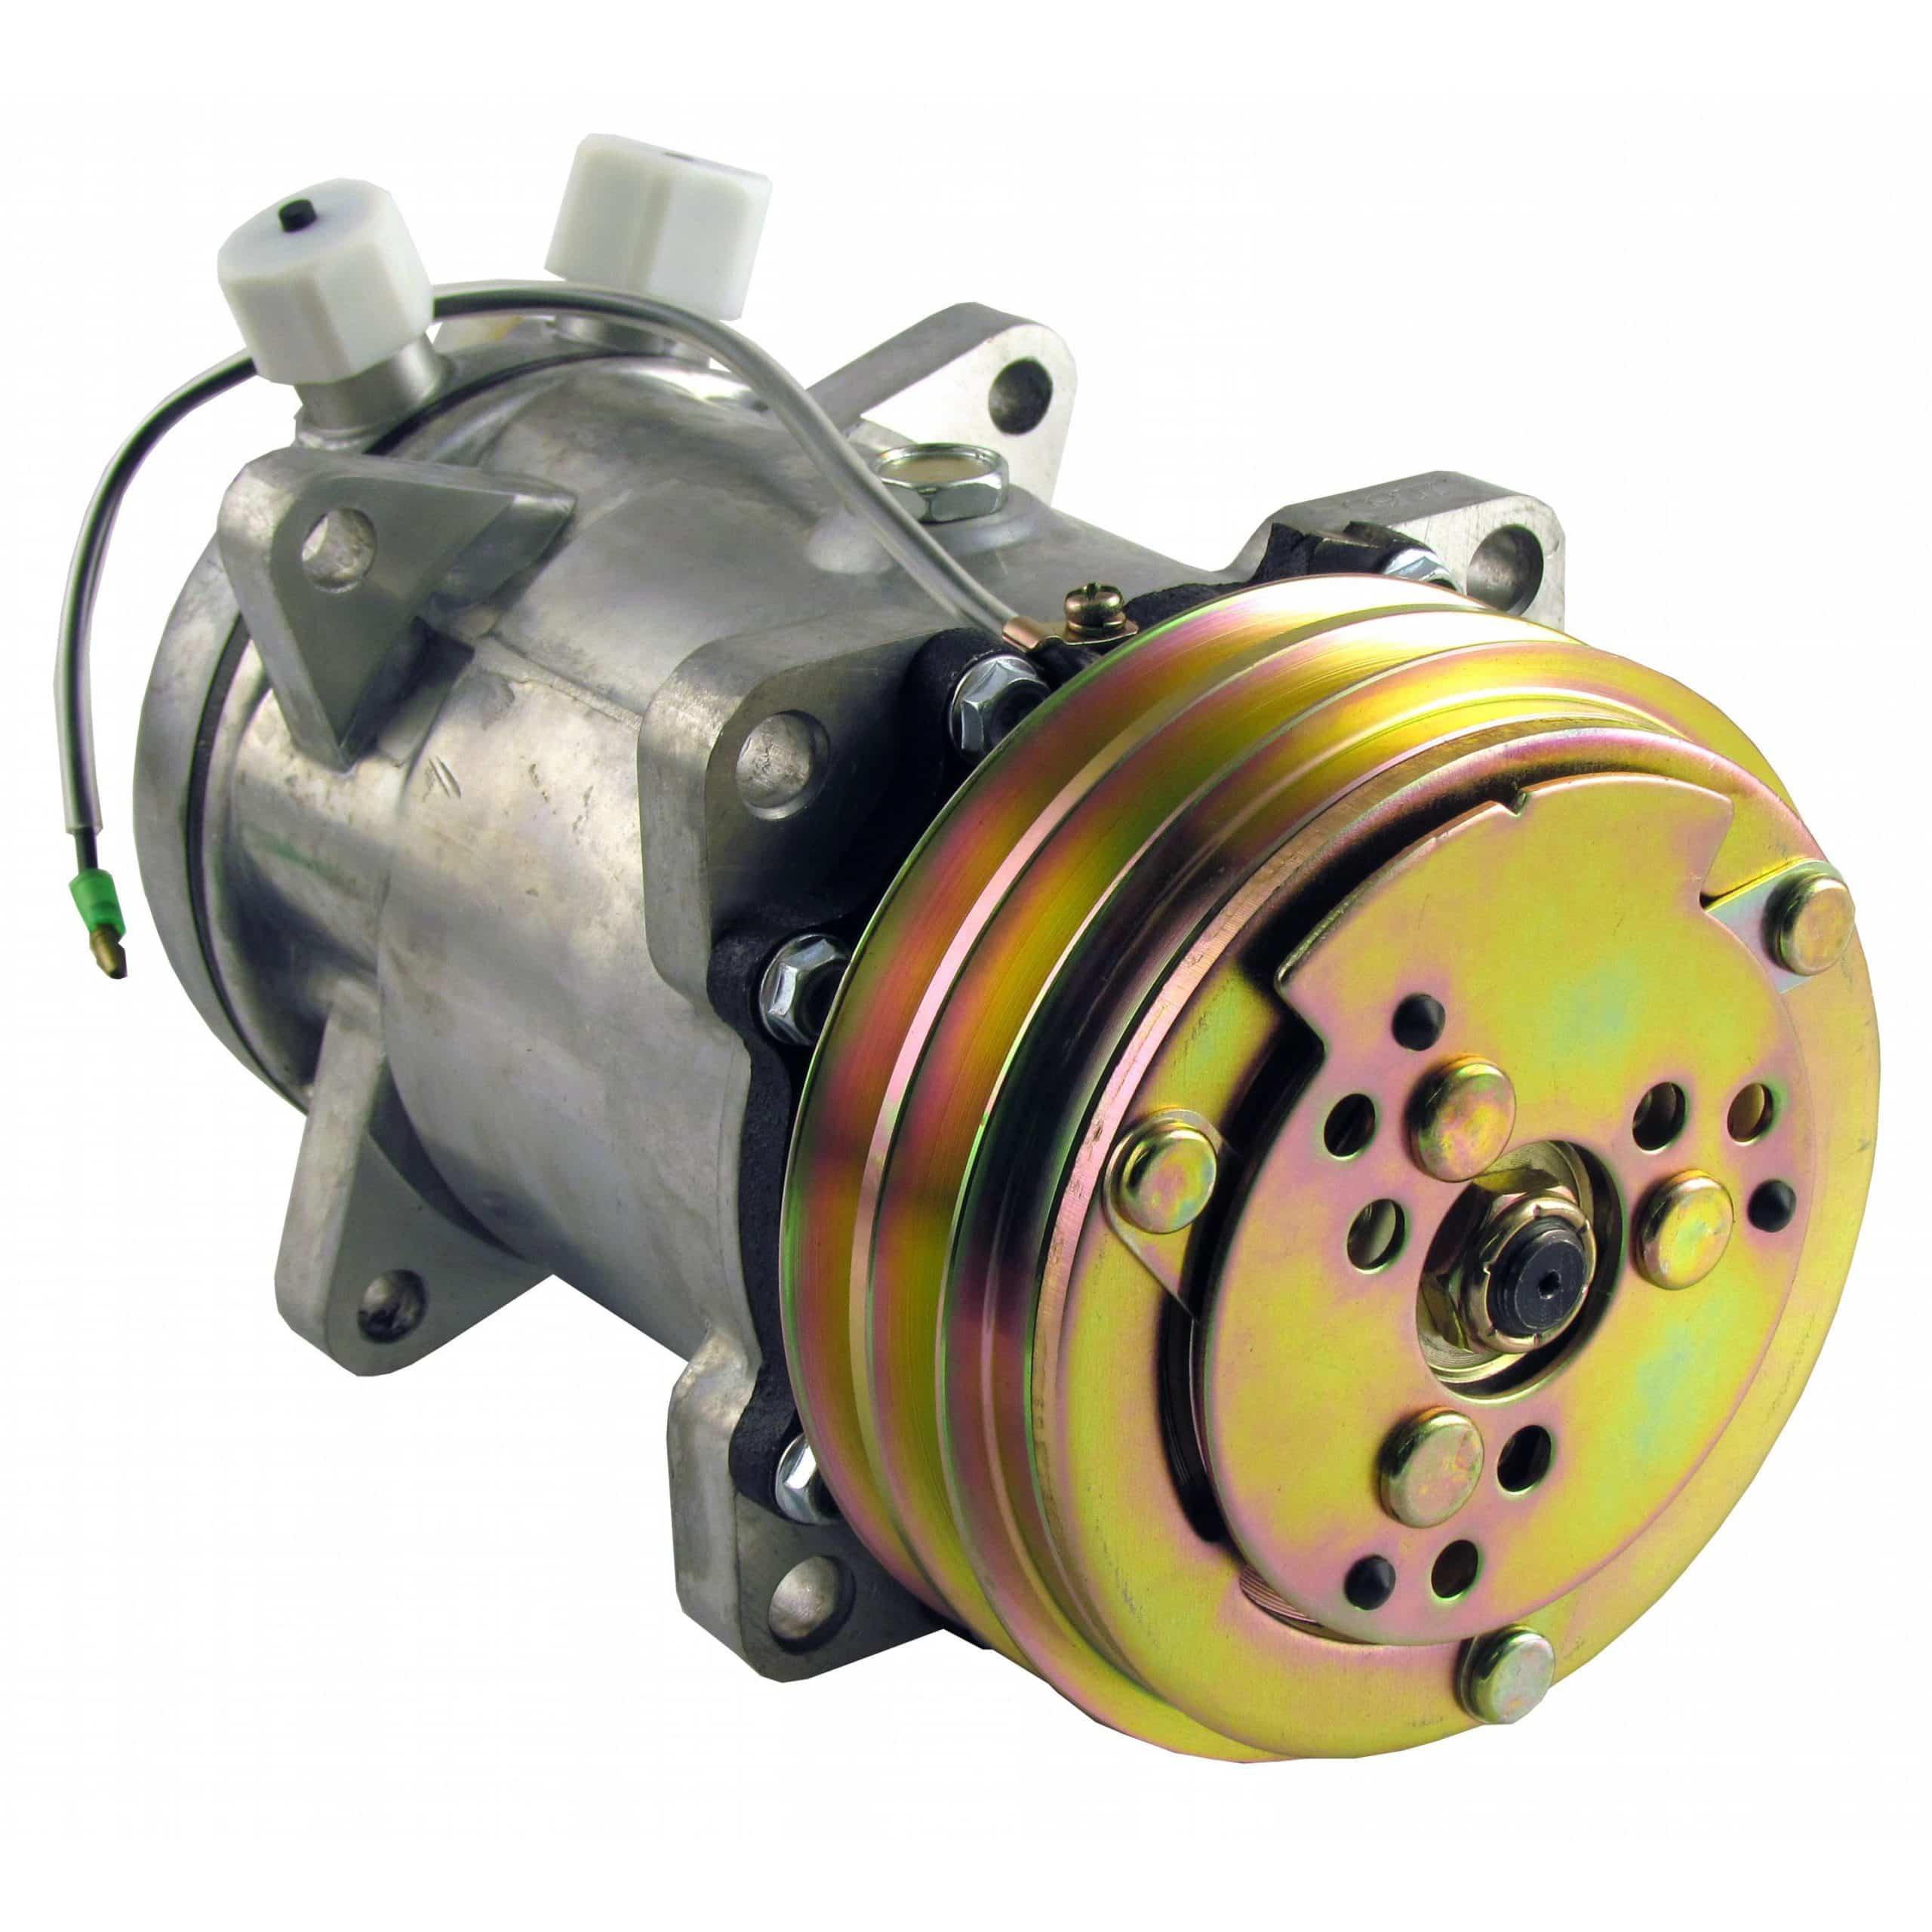 hesston-fiat-tractor-sanden-sdhd-compressor-w-groove-clutch-air-conditioner